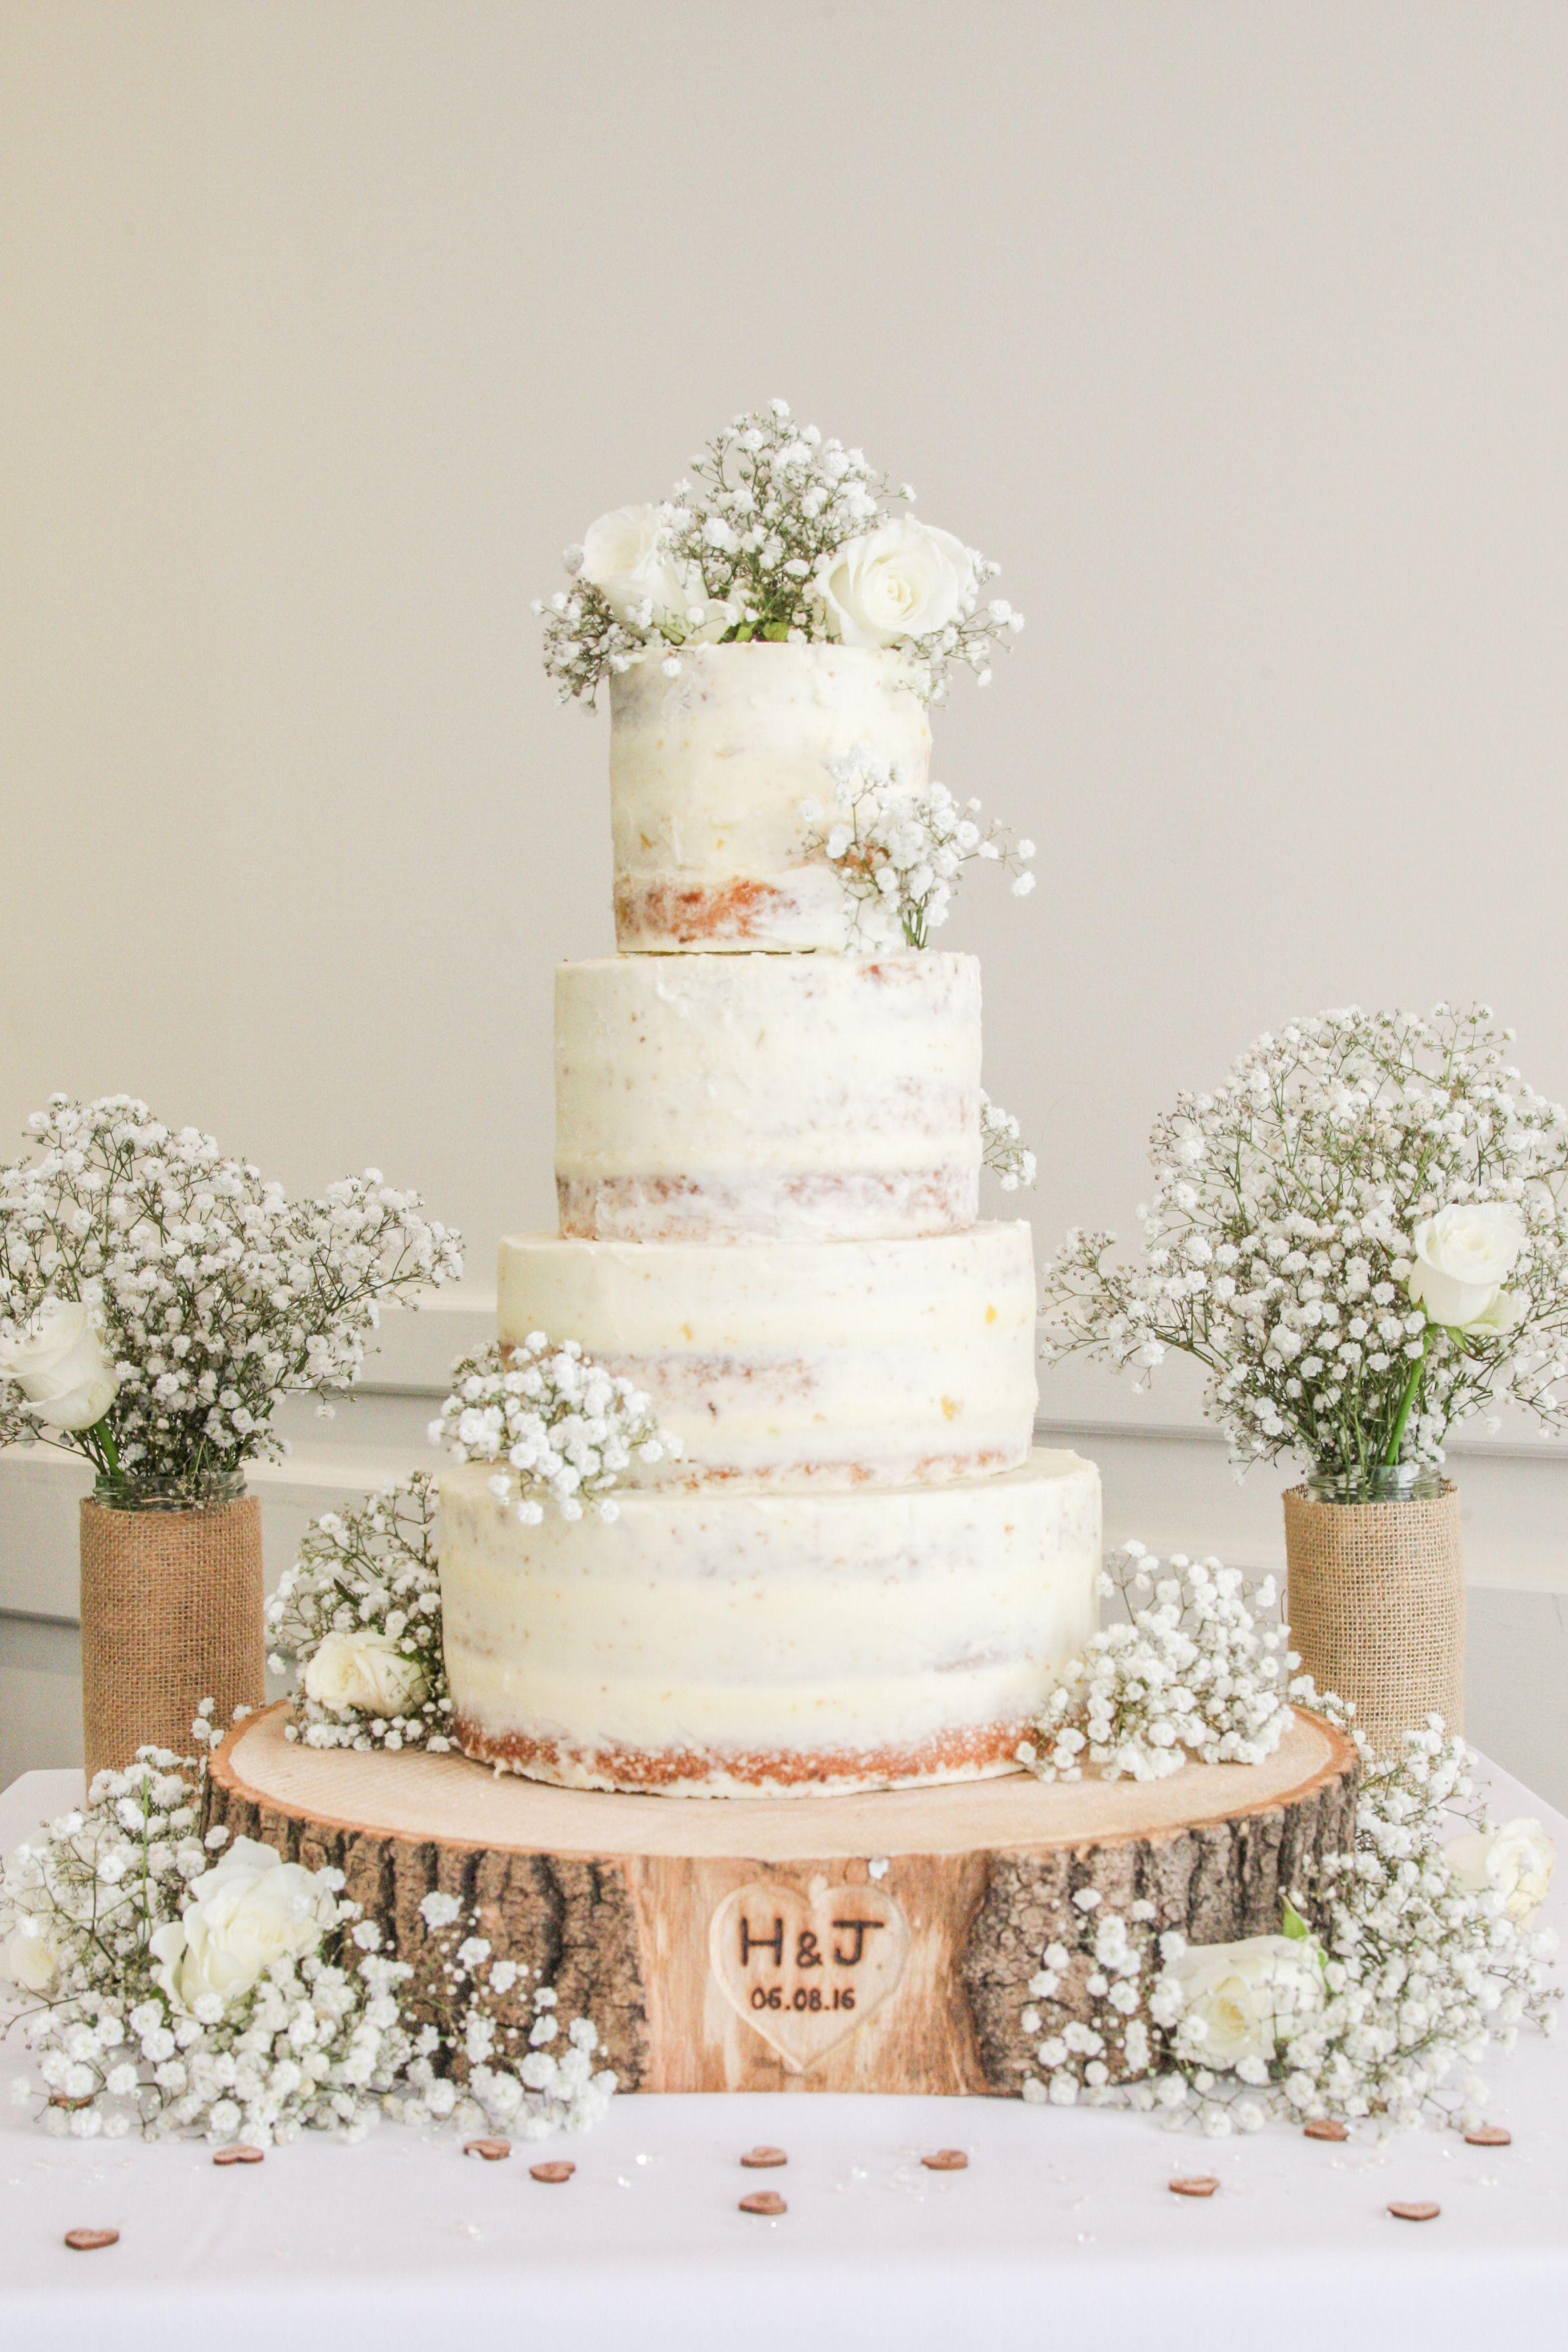 Semi naked limoncello 4 tier wedding cake on a engraved